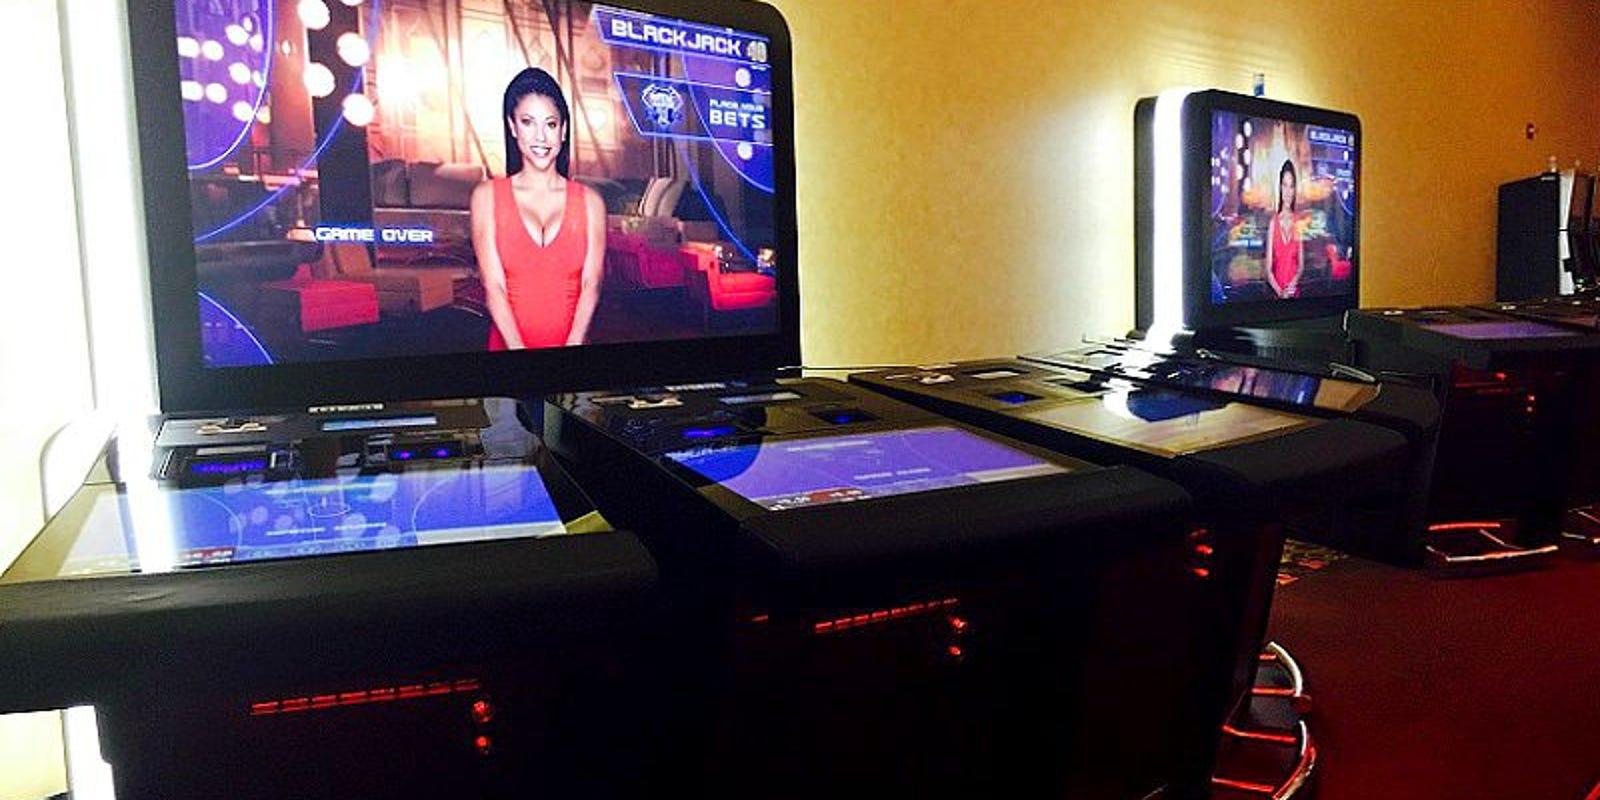 empire casino yonkers blackjack